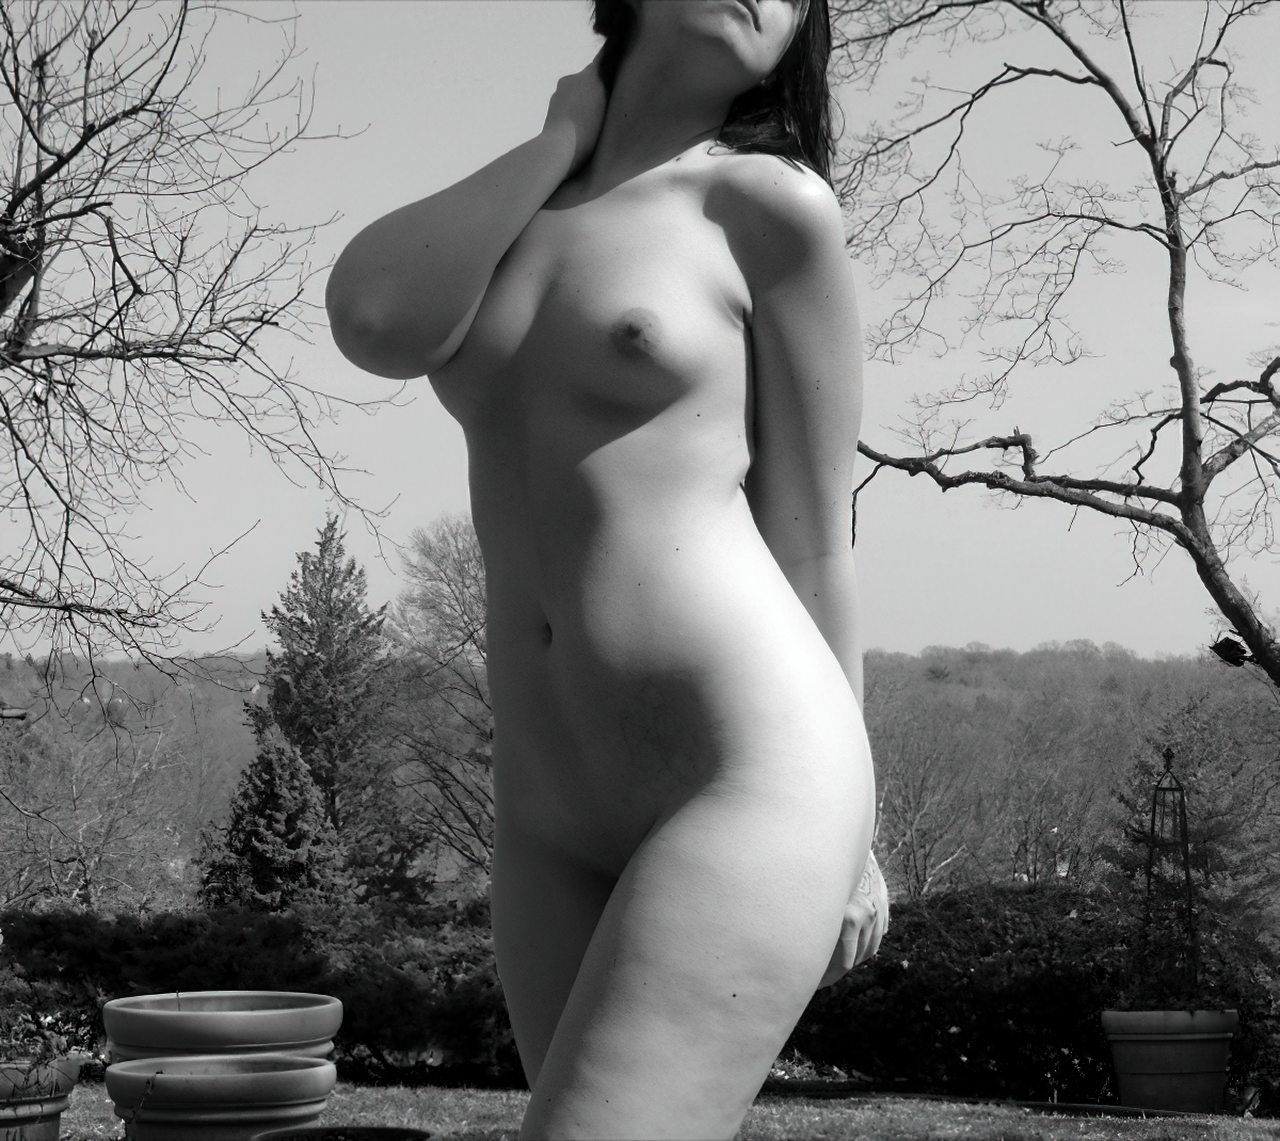 Sensualidade a Preto e Branco (11)